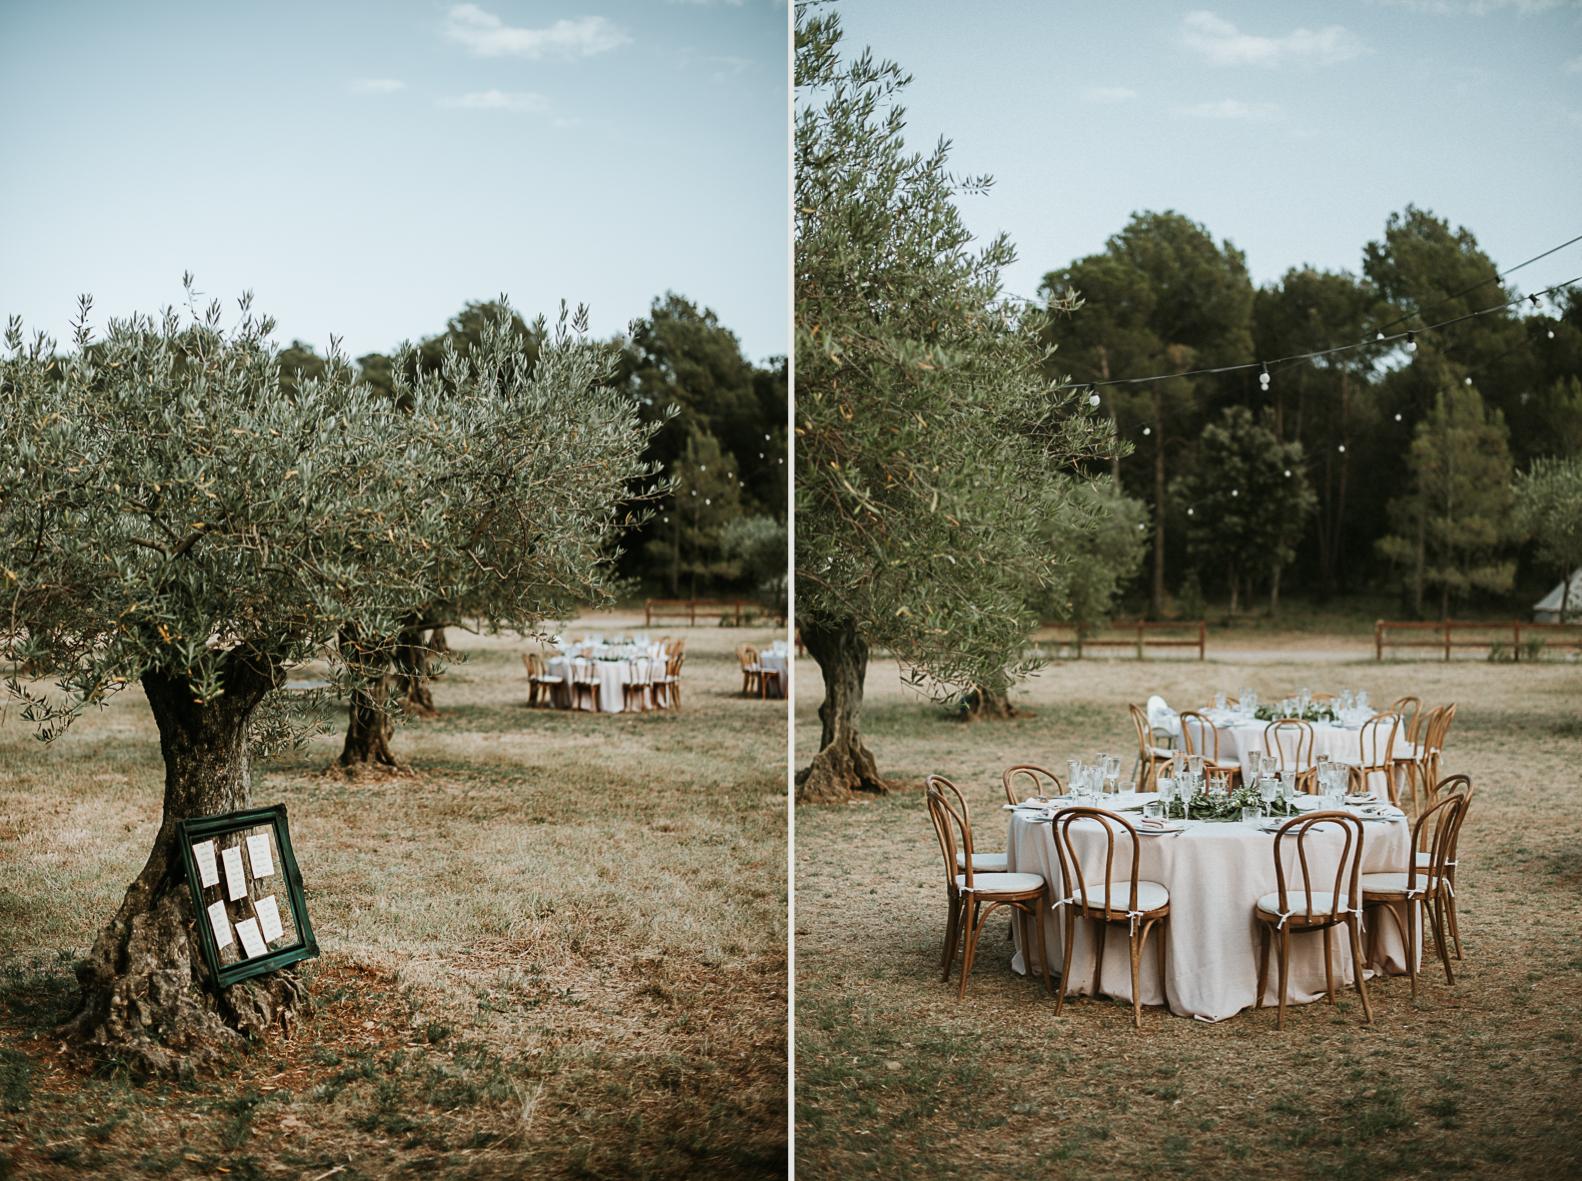 miks-sels-mas-terrats-girona-wedding-photographer-86.1